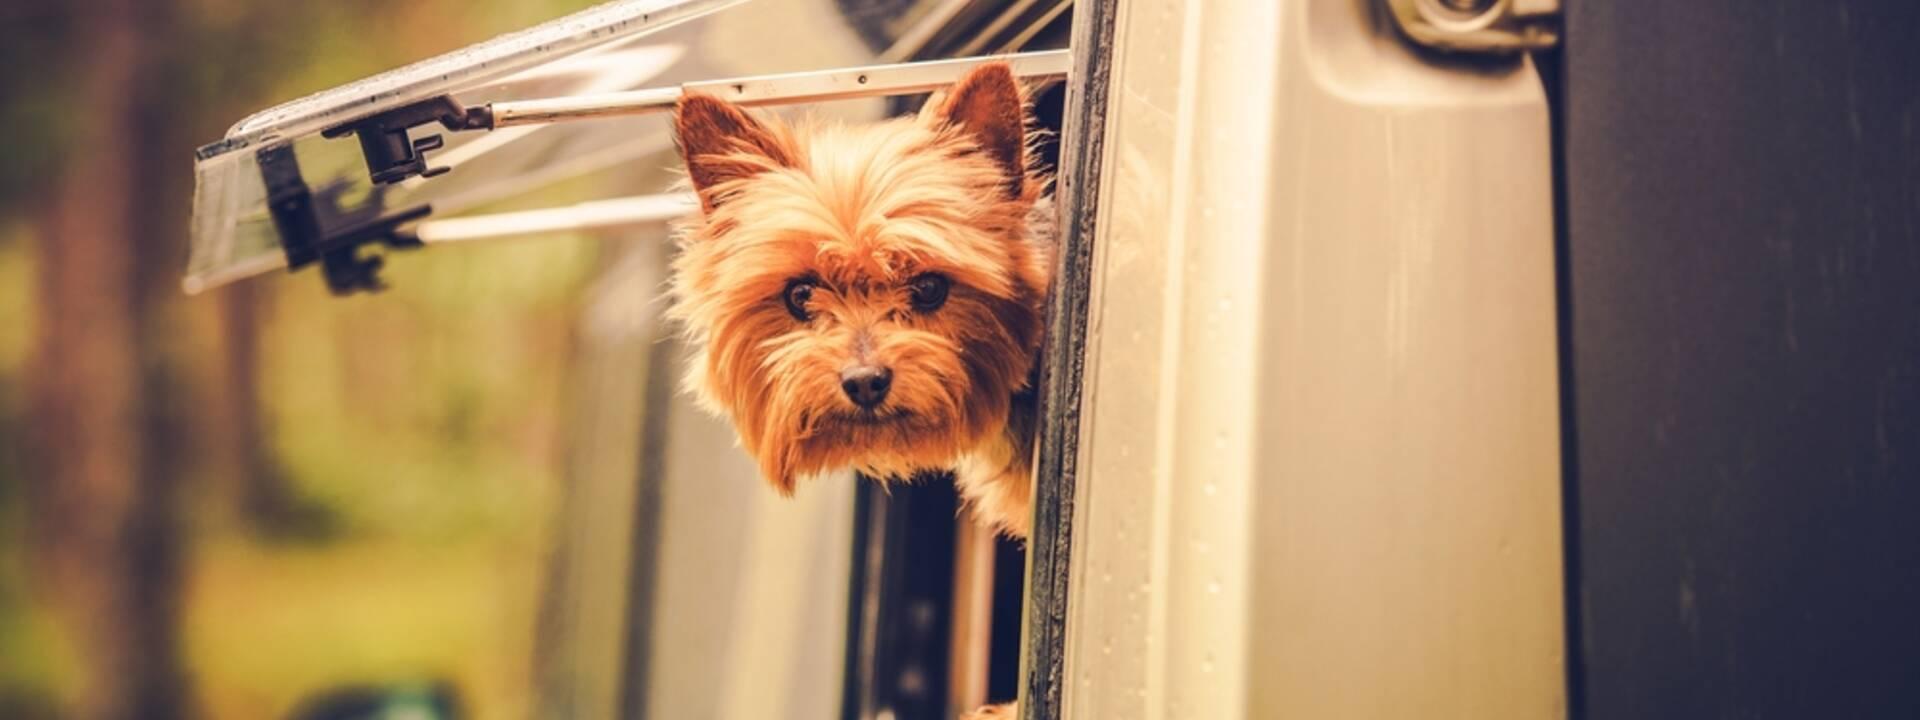 Petit chien dans un camping-car - ©Shutterstock